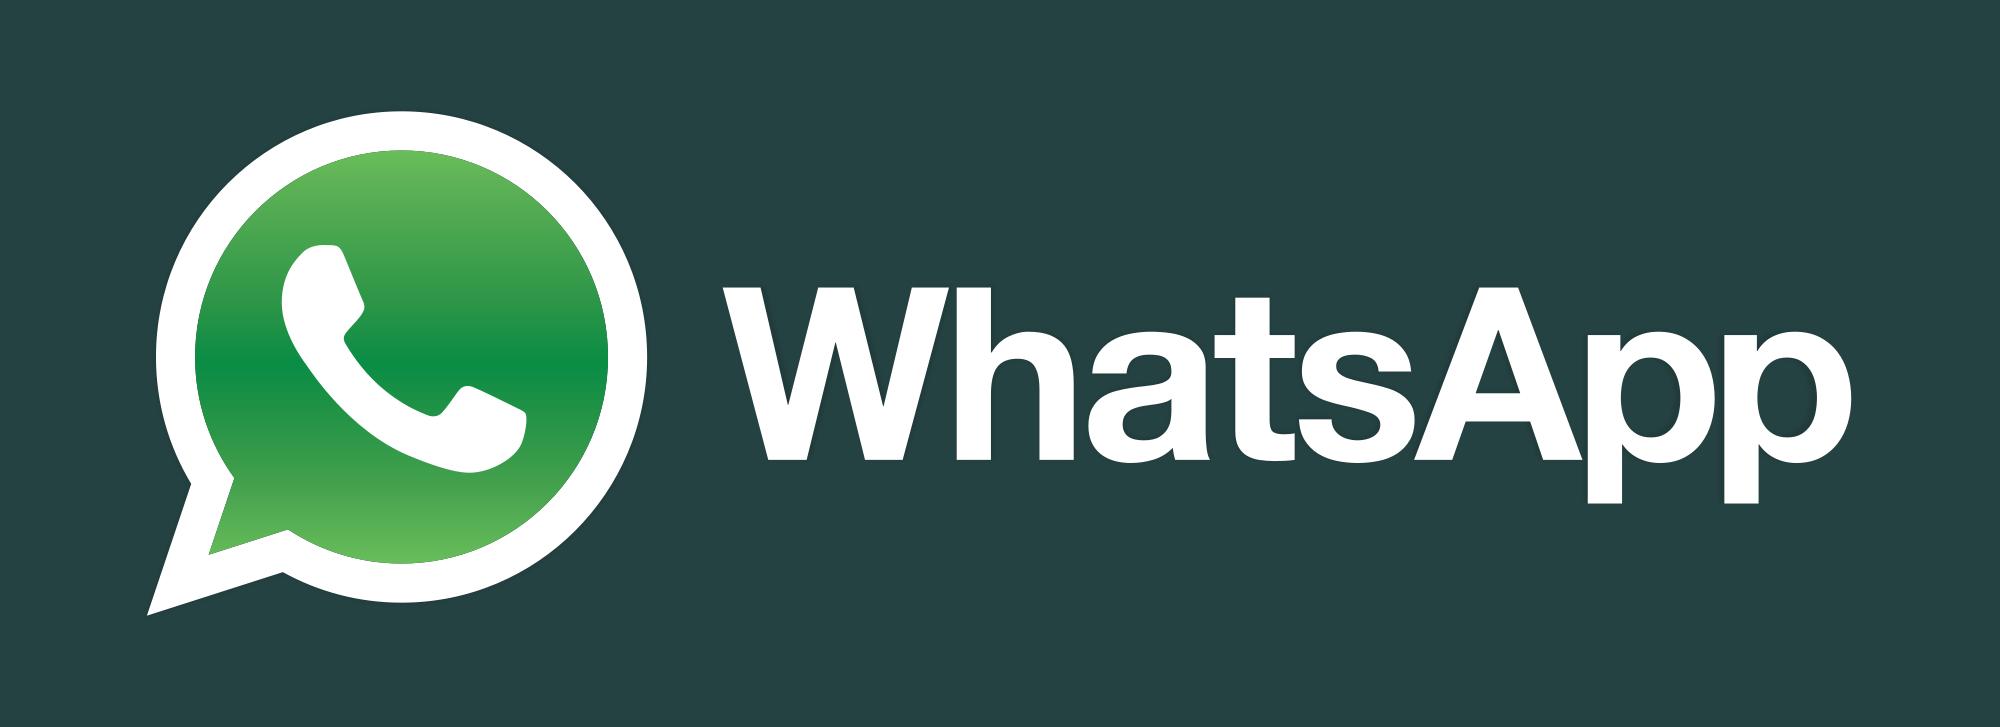 Whatsapp Png Файл:whatsapp logo.png